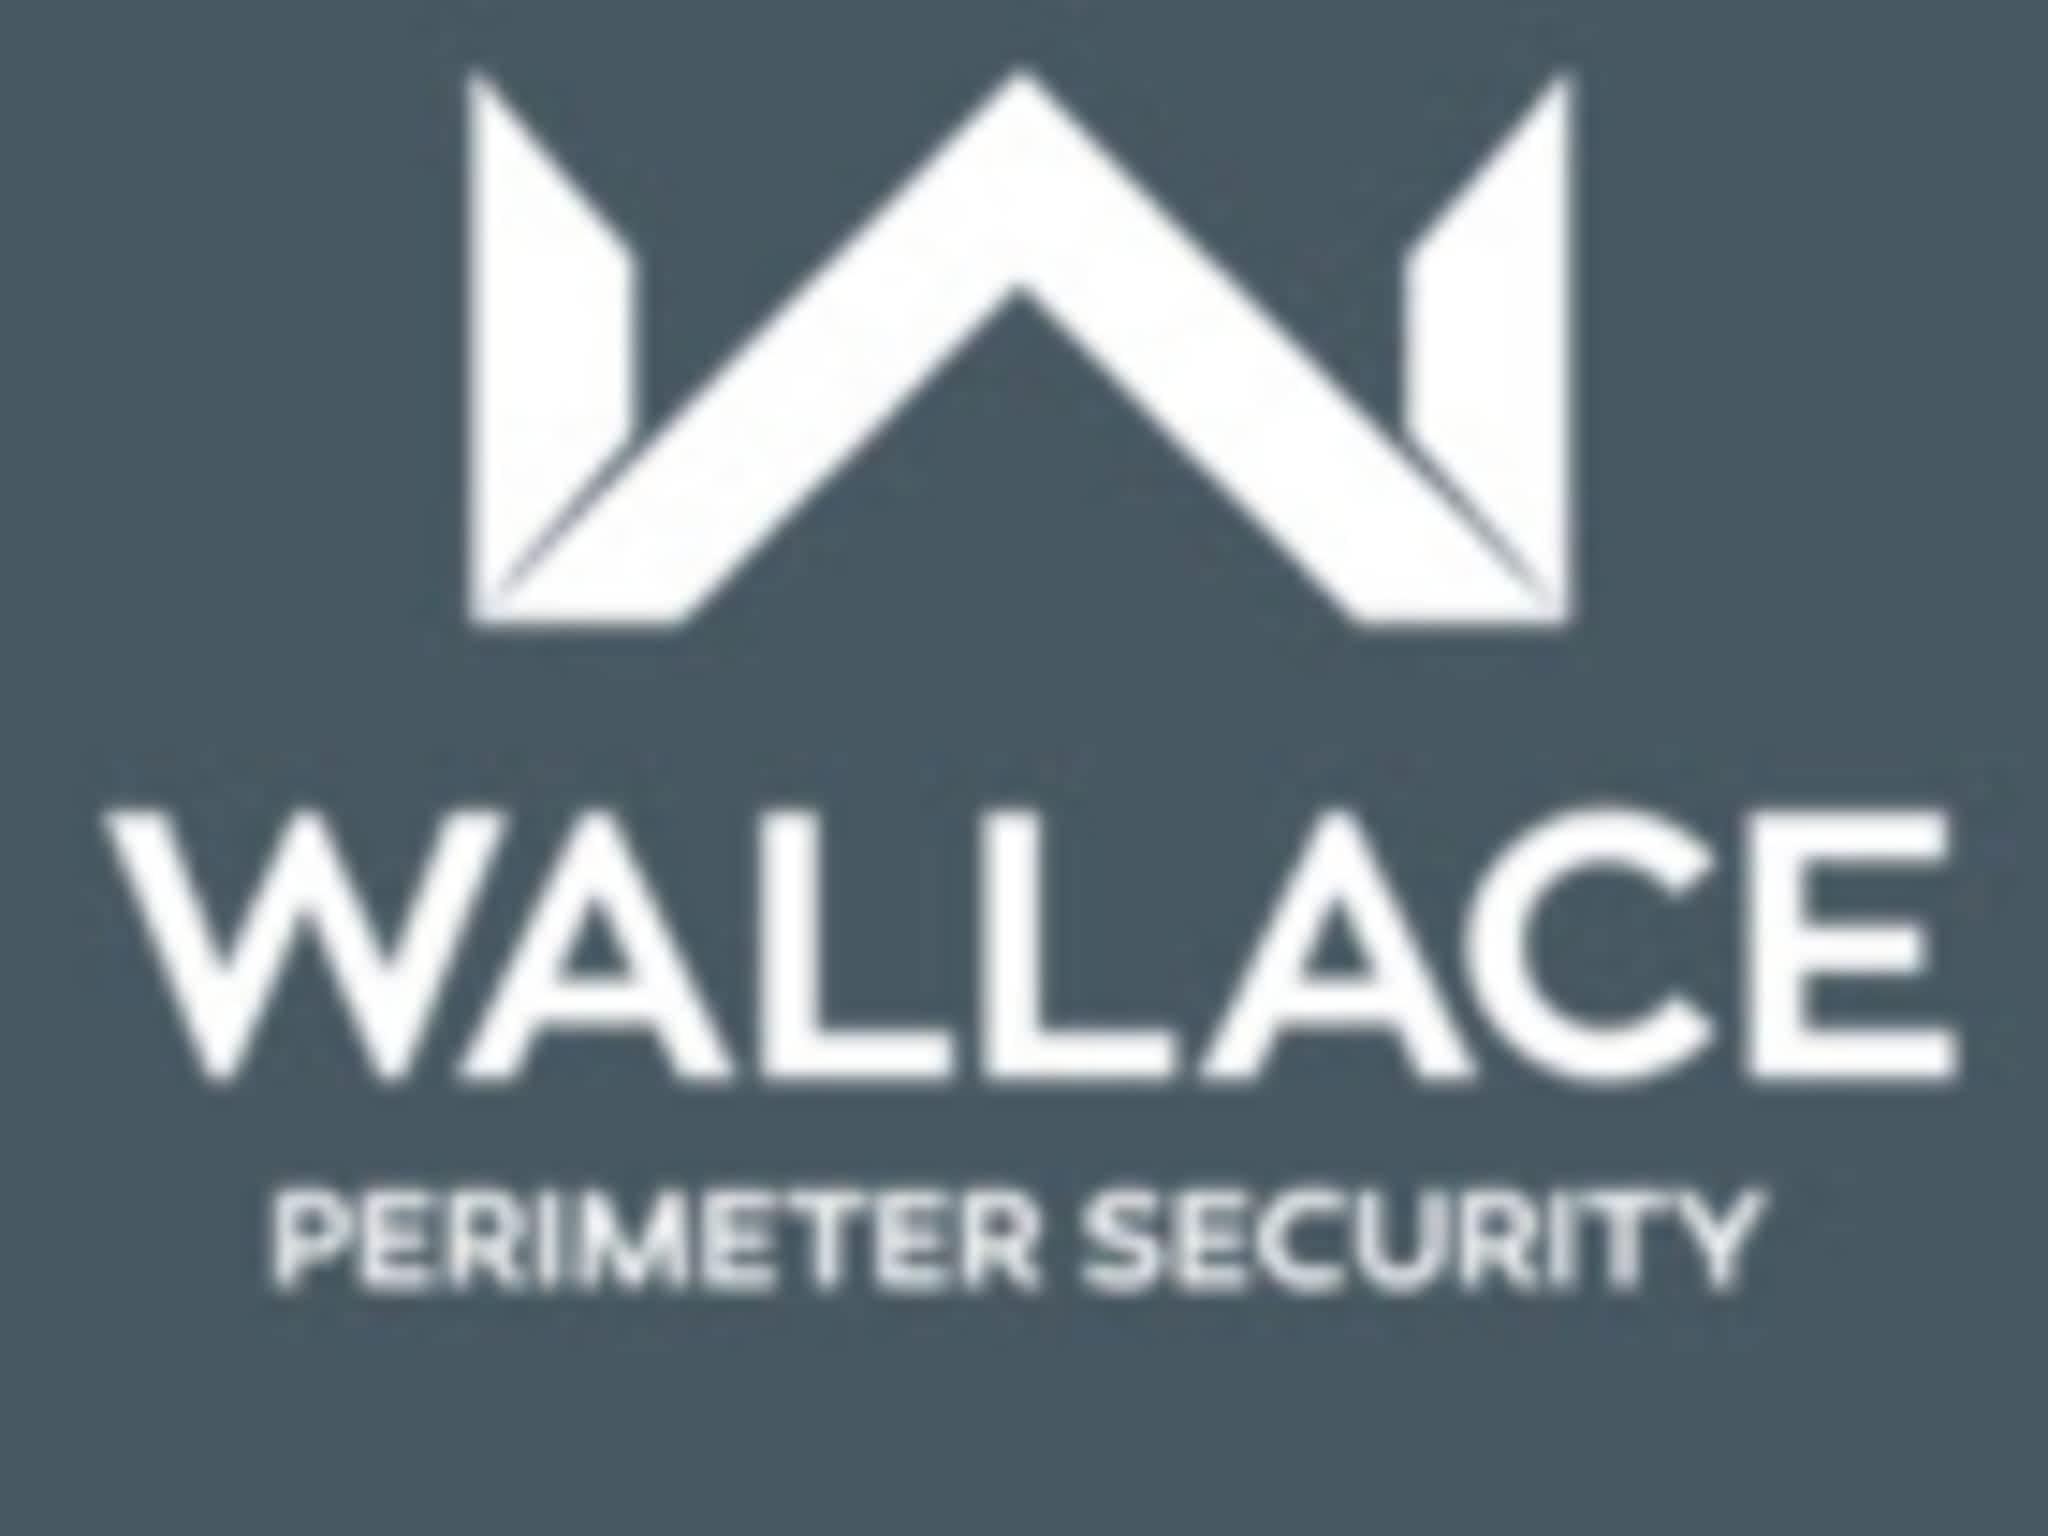 photo WALLACE PERIMETER SECURITY